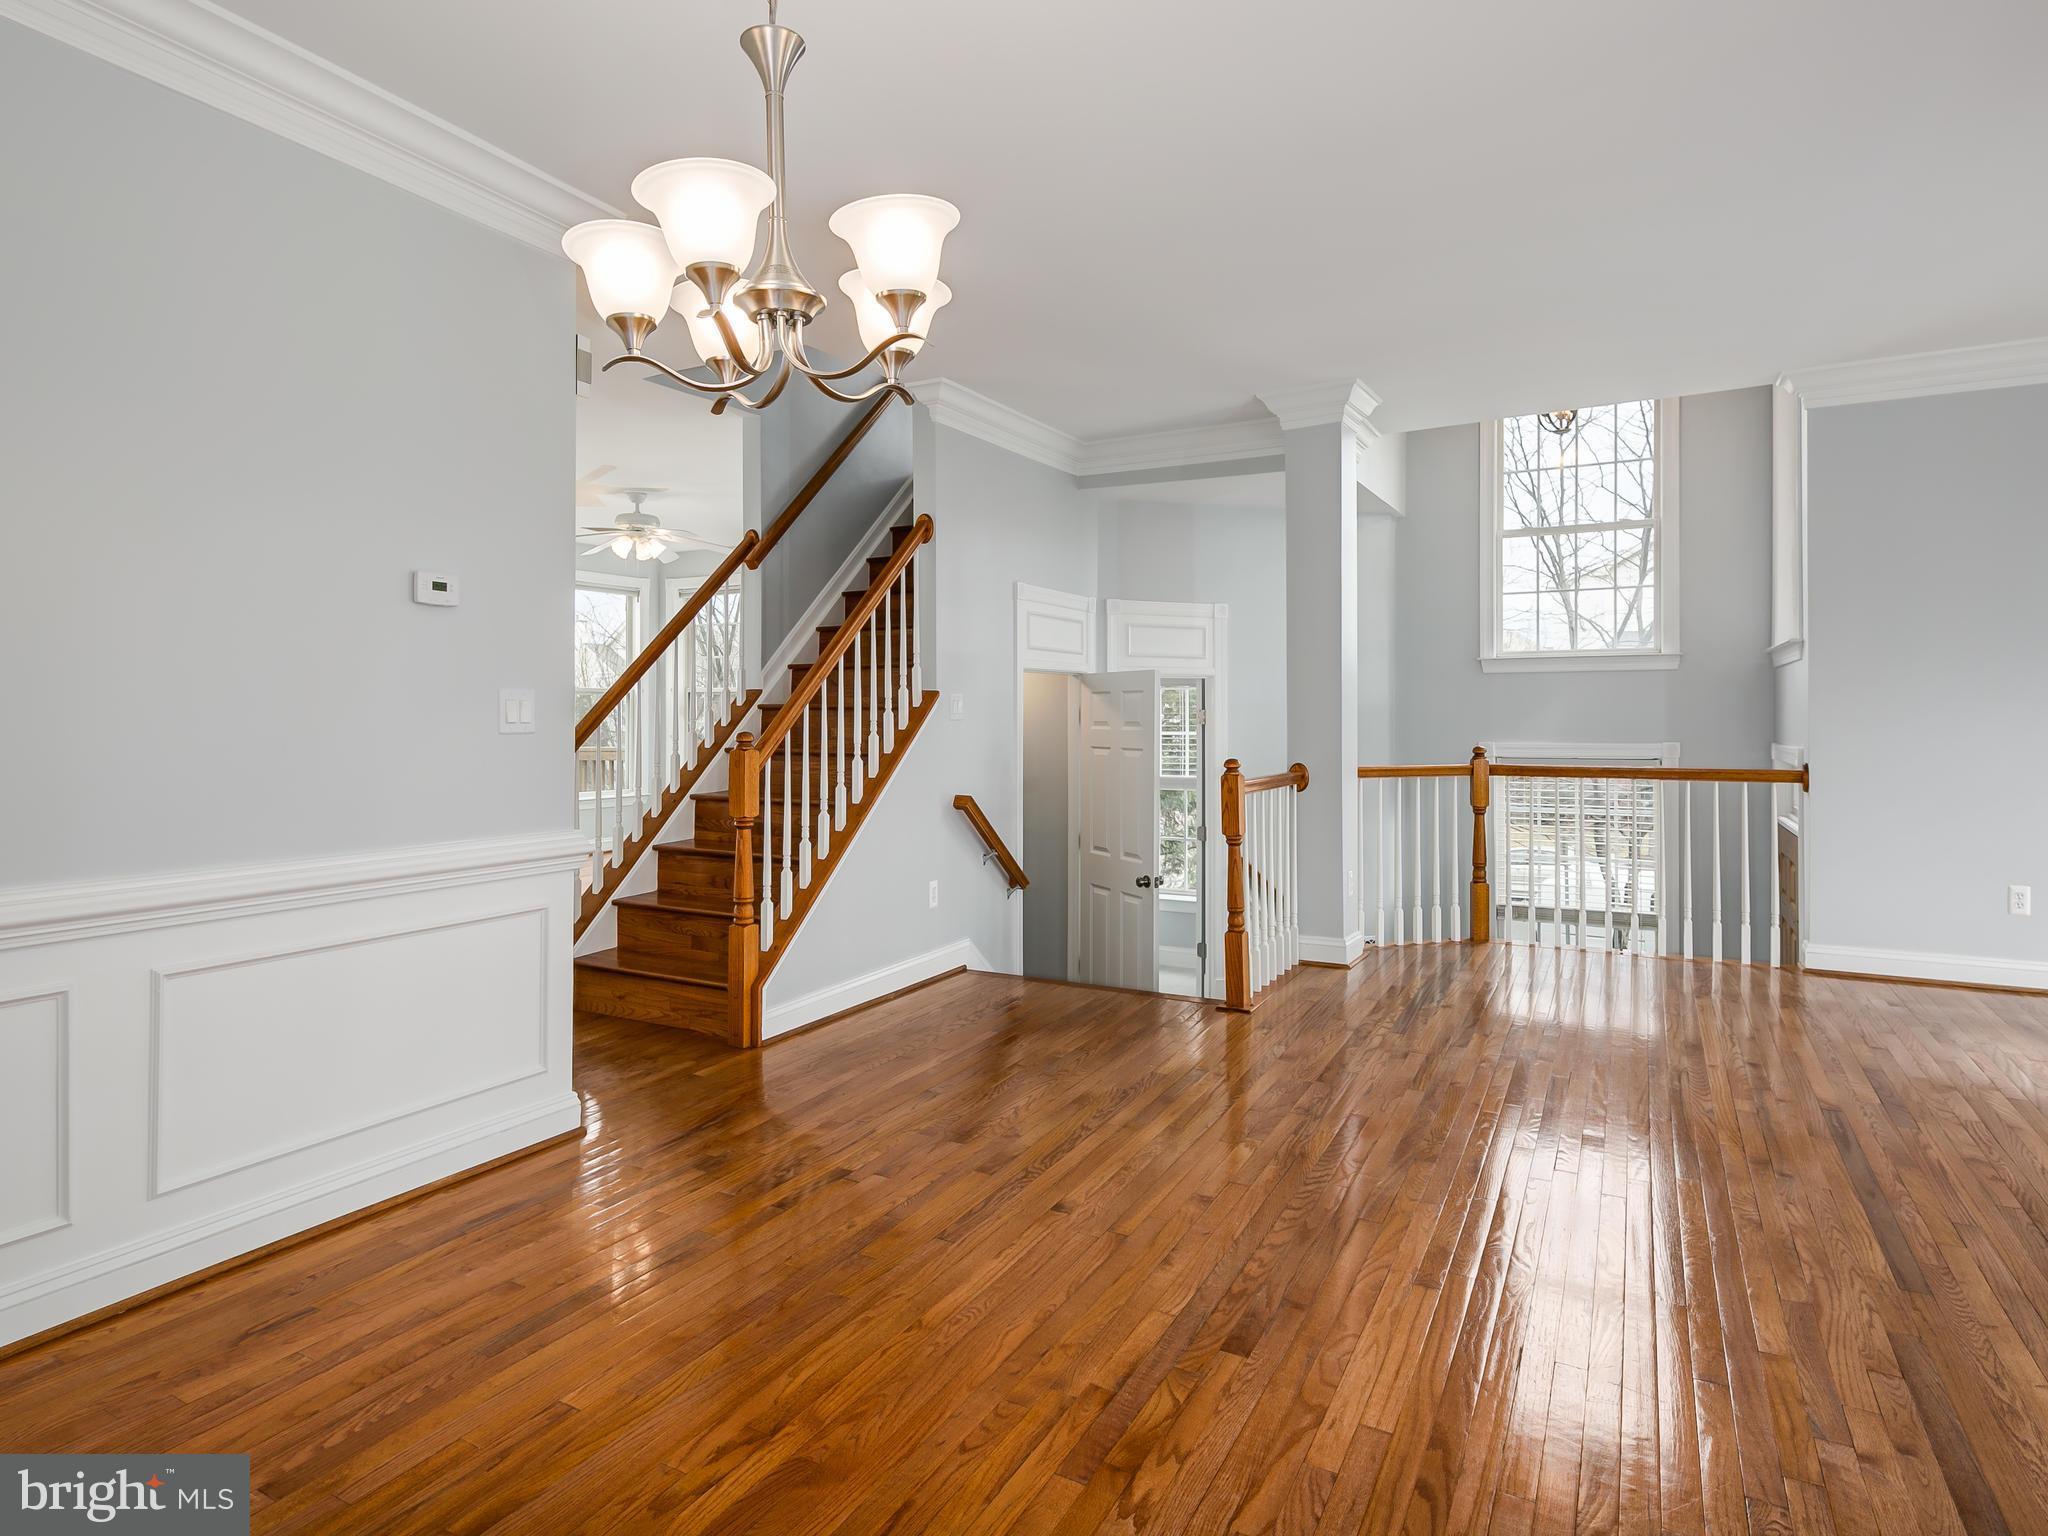 Chaparral Sagebrush Floor In Sterling Va Installed By Homeowner Abbey Design Center Expert Home Remodeling Servicesabbeydesigncenter